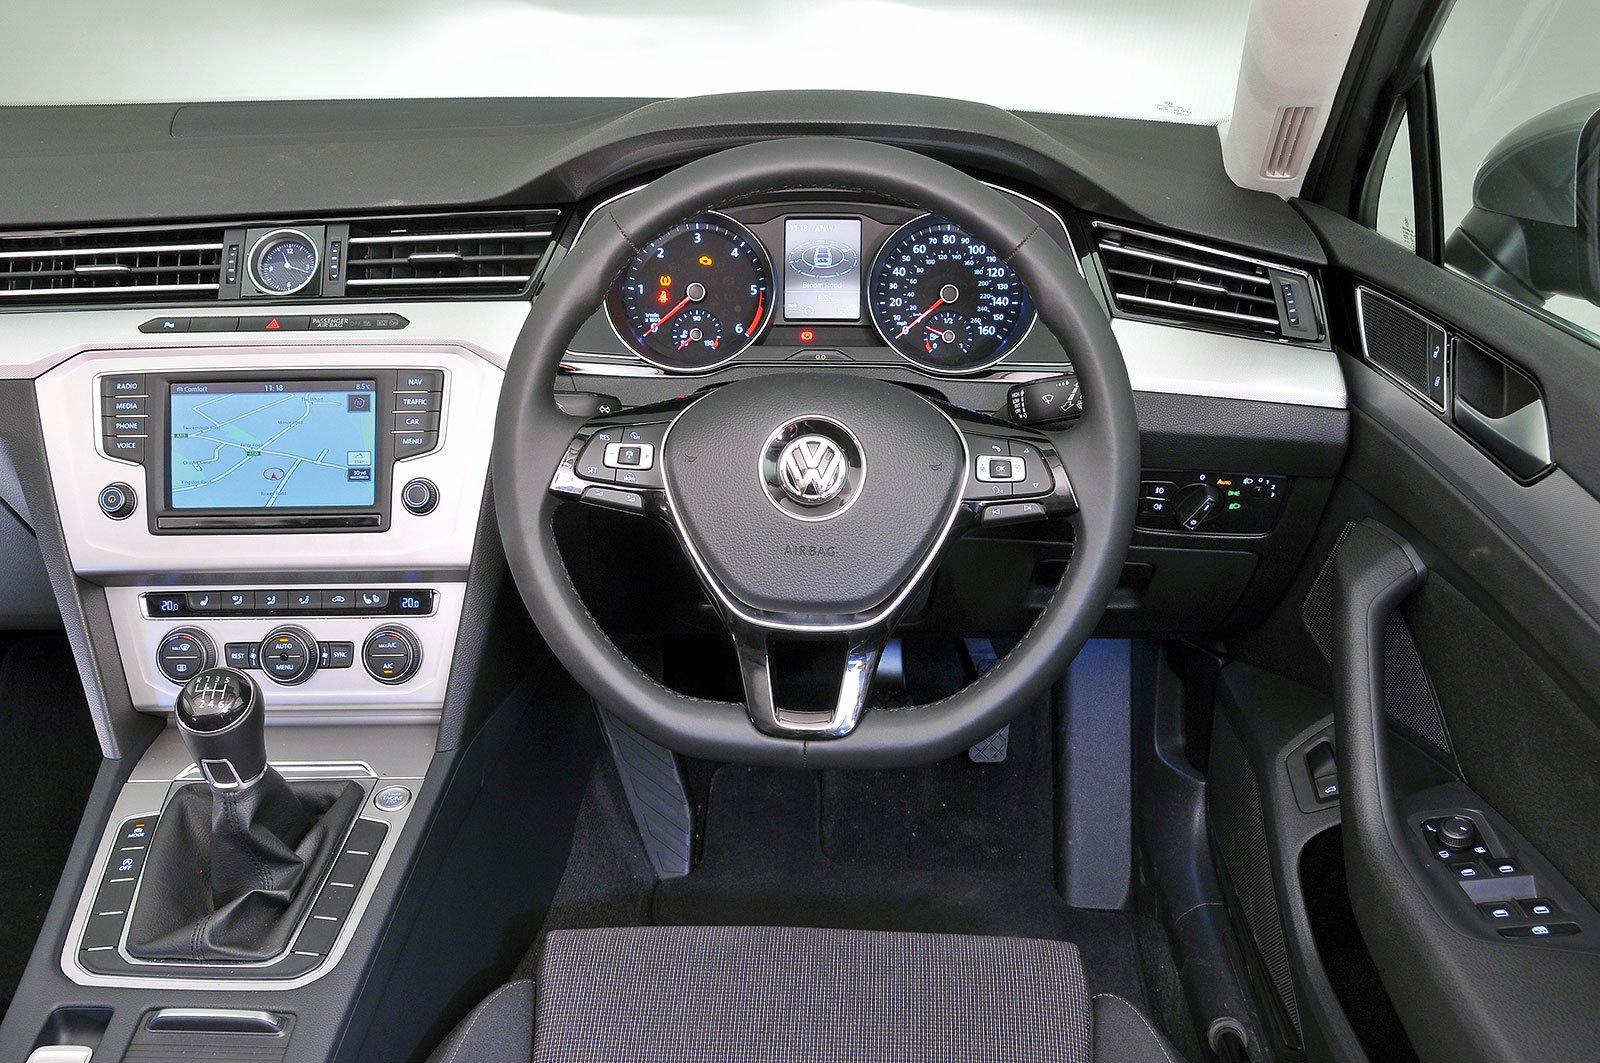 Volkswagen Passat Estate (2015-present) - interior